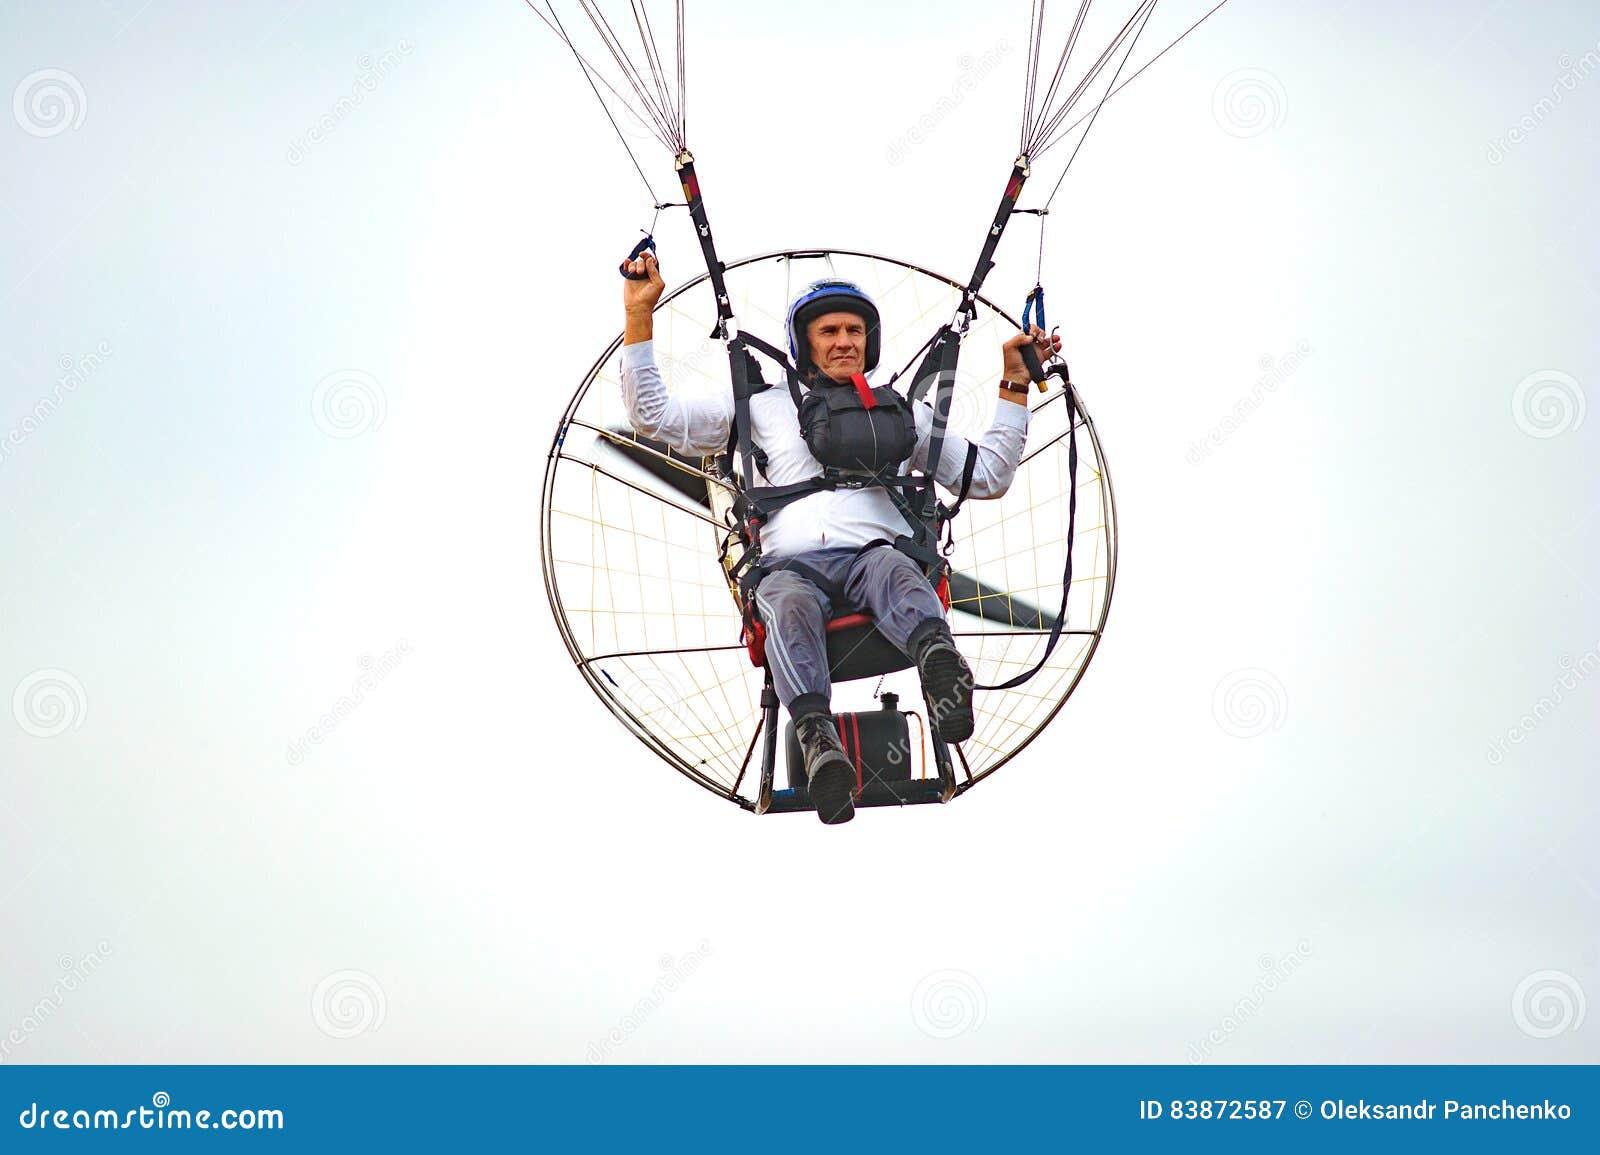 Bila Tserkva, Ukraine  June 20, 2016 Paragliding, Training